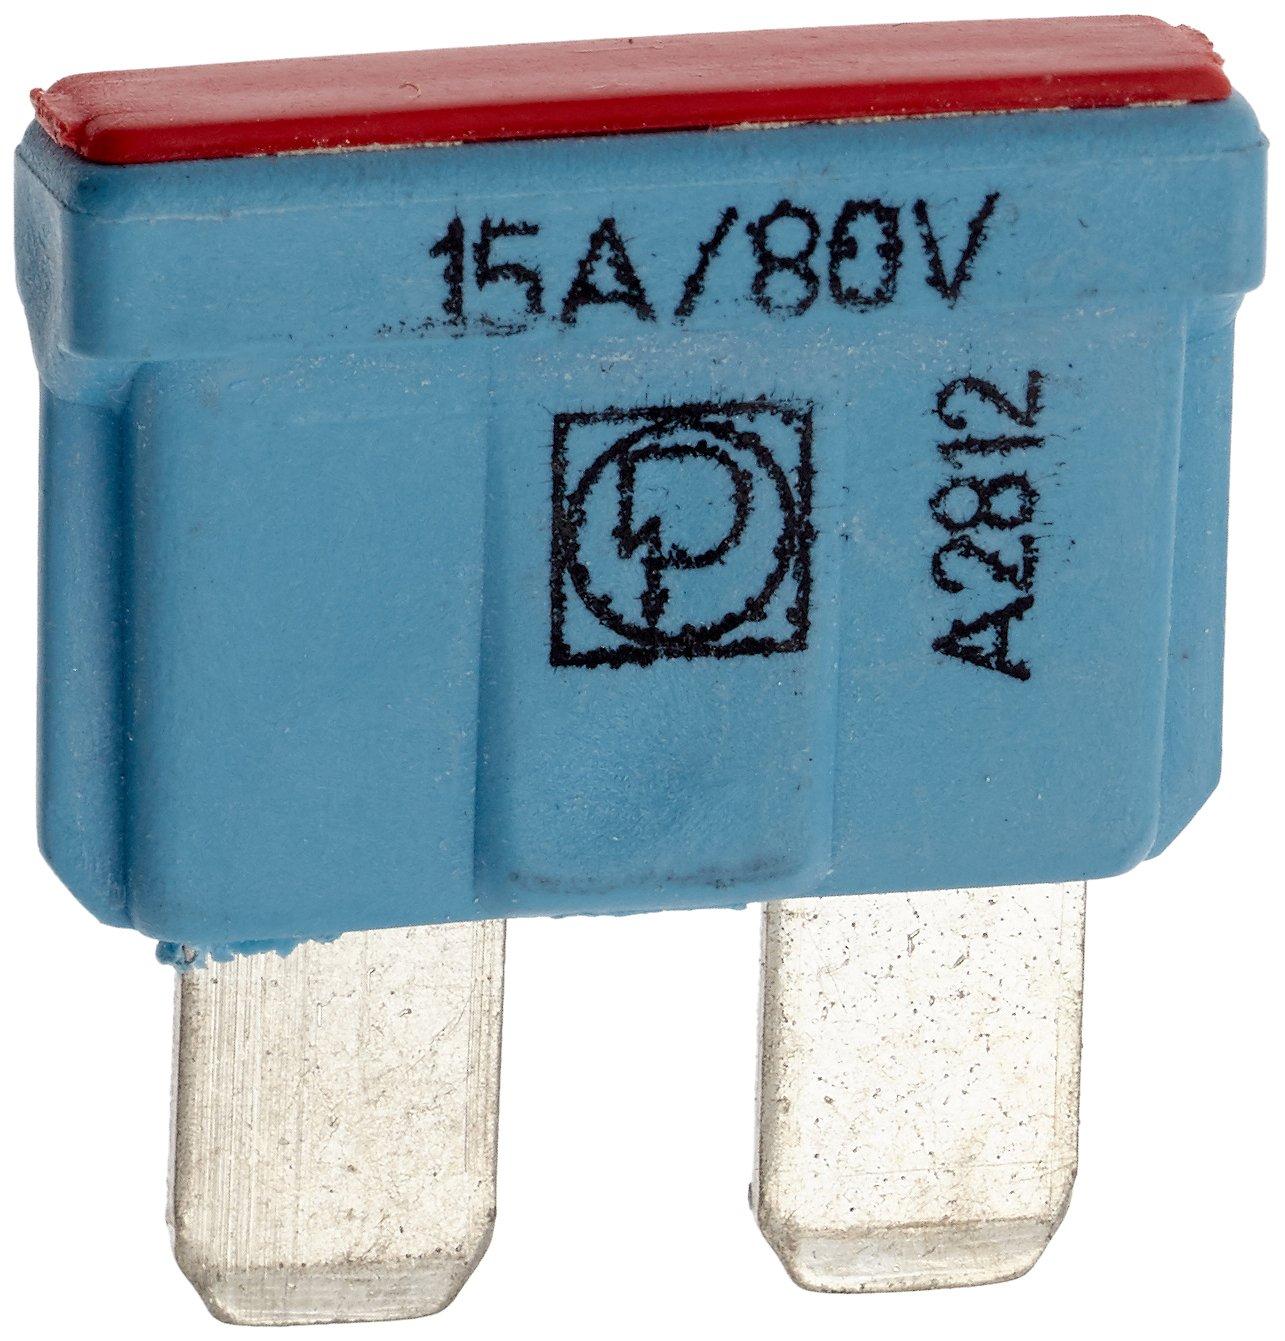 80V 365382 Flachstecksicherung Kfz Mehrfarbig 50104 VS-ELECTRONIC 15 Amp